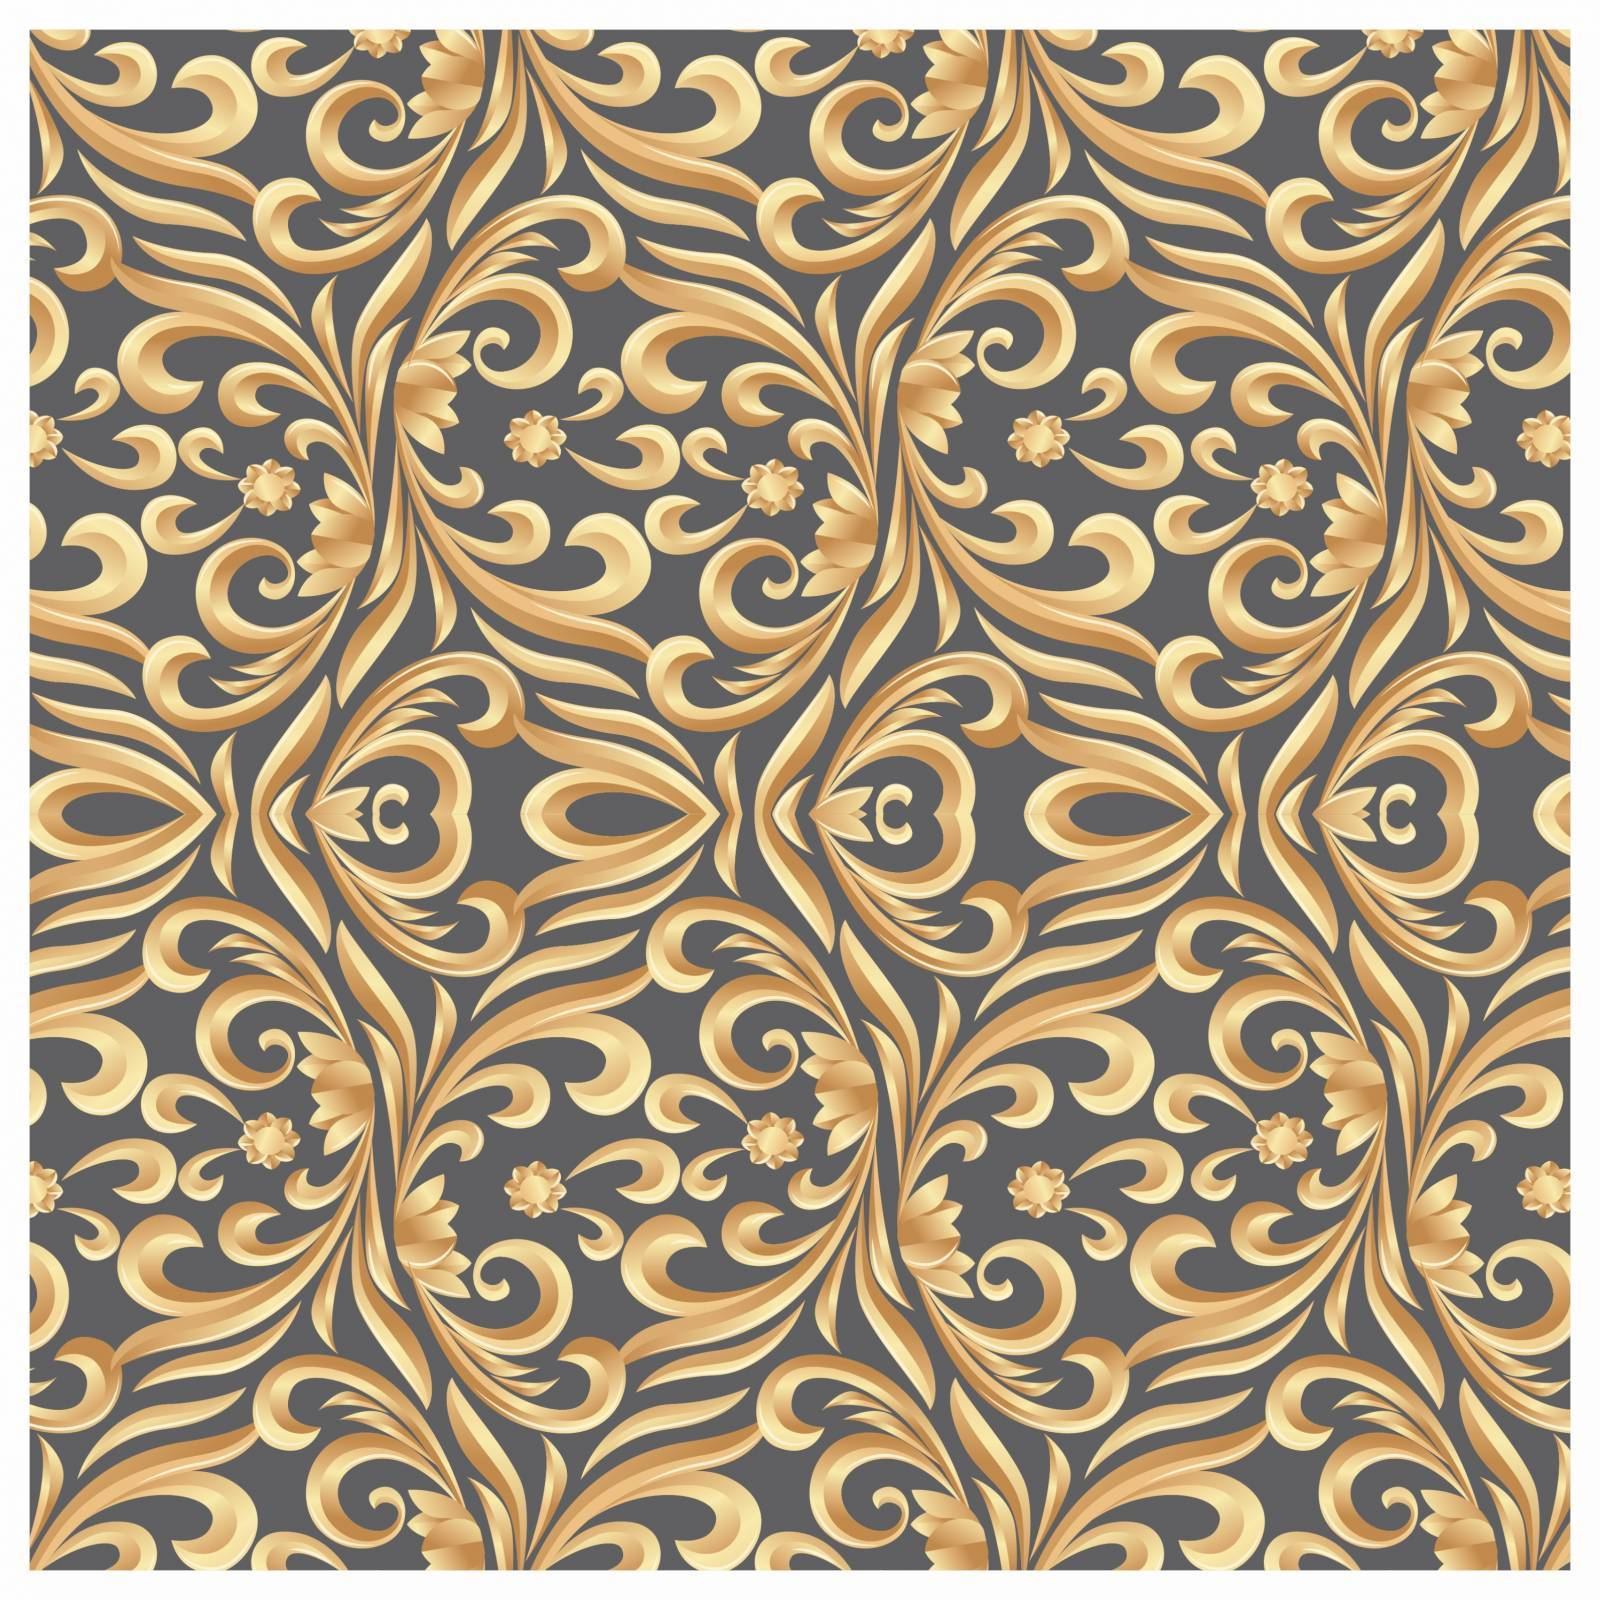 Papel De Parede Adesivo Arabesco Floral 300x52cm - LCGELETRO